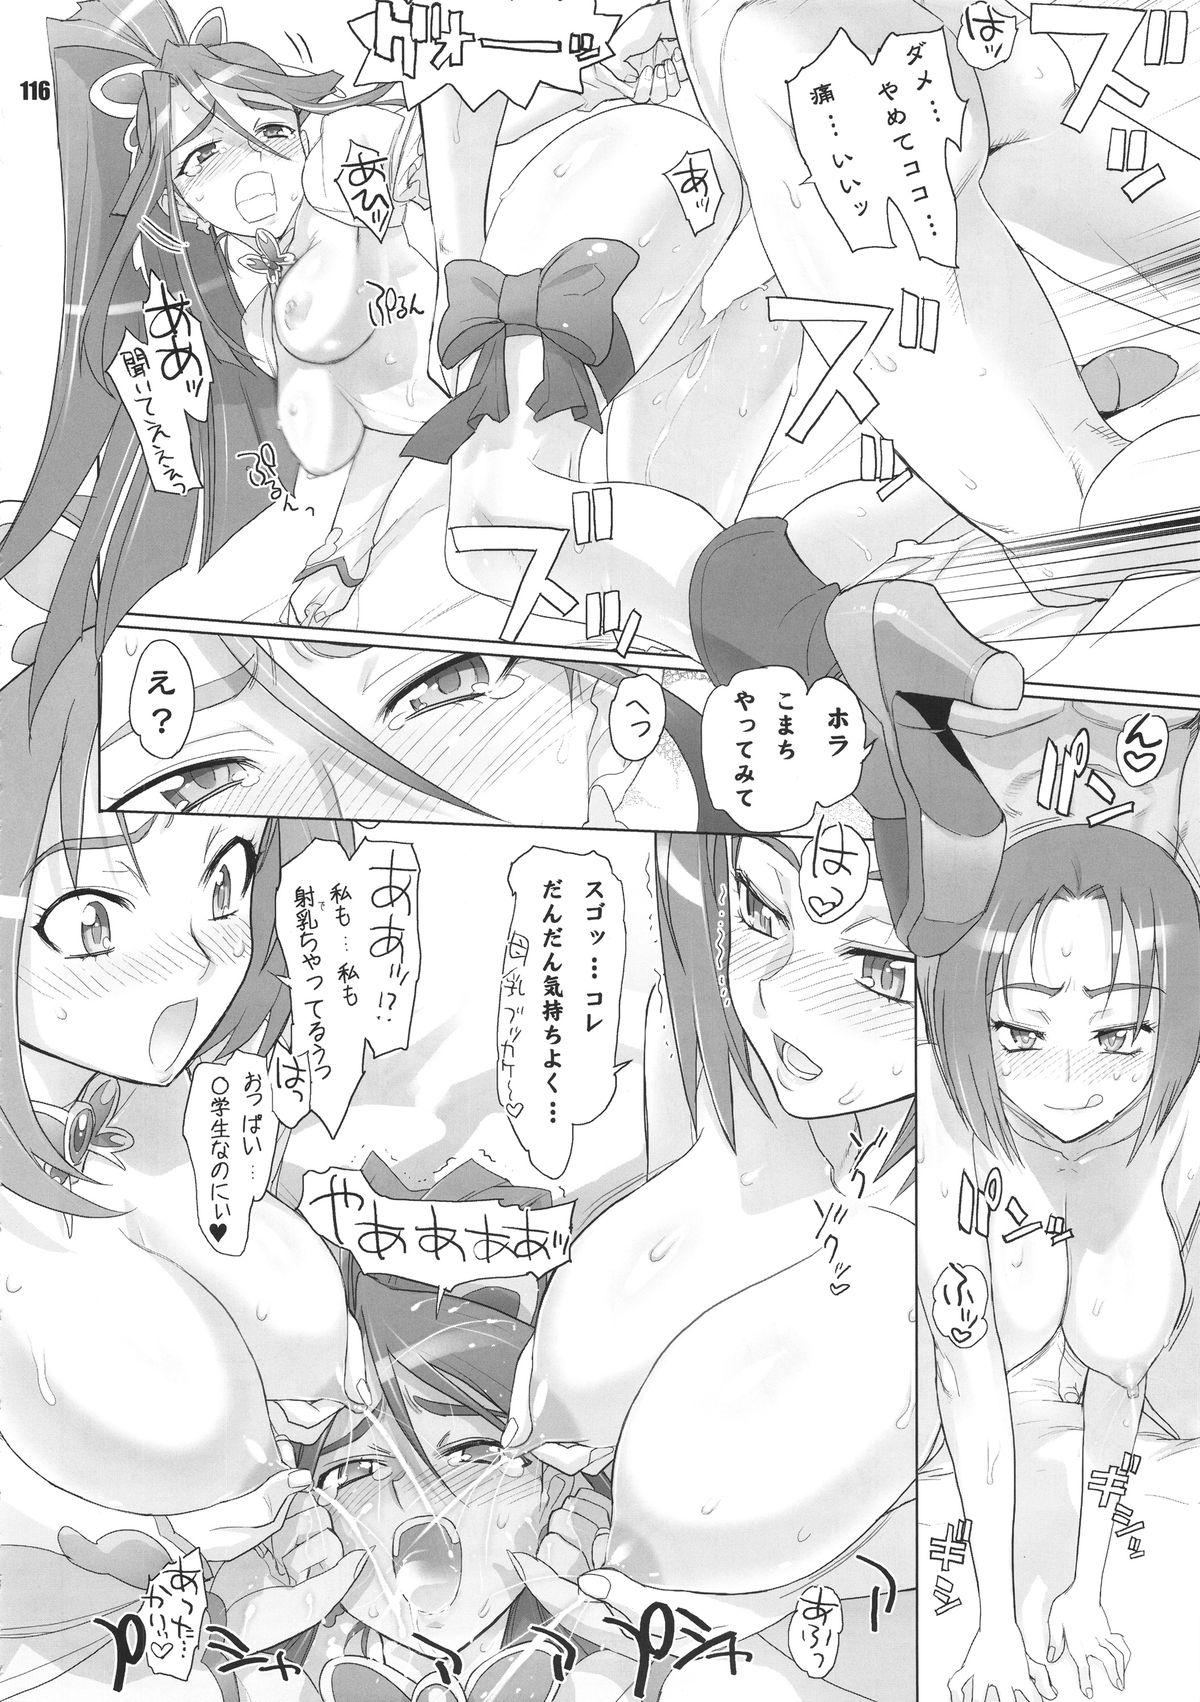 Inazuma Pretty Warrior 114